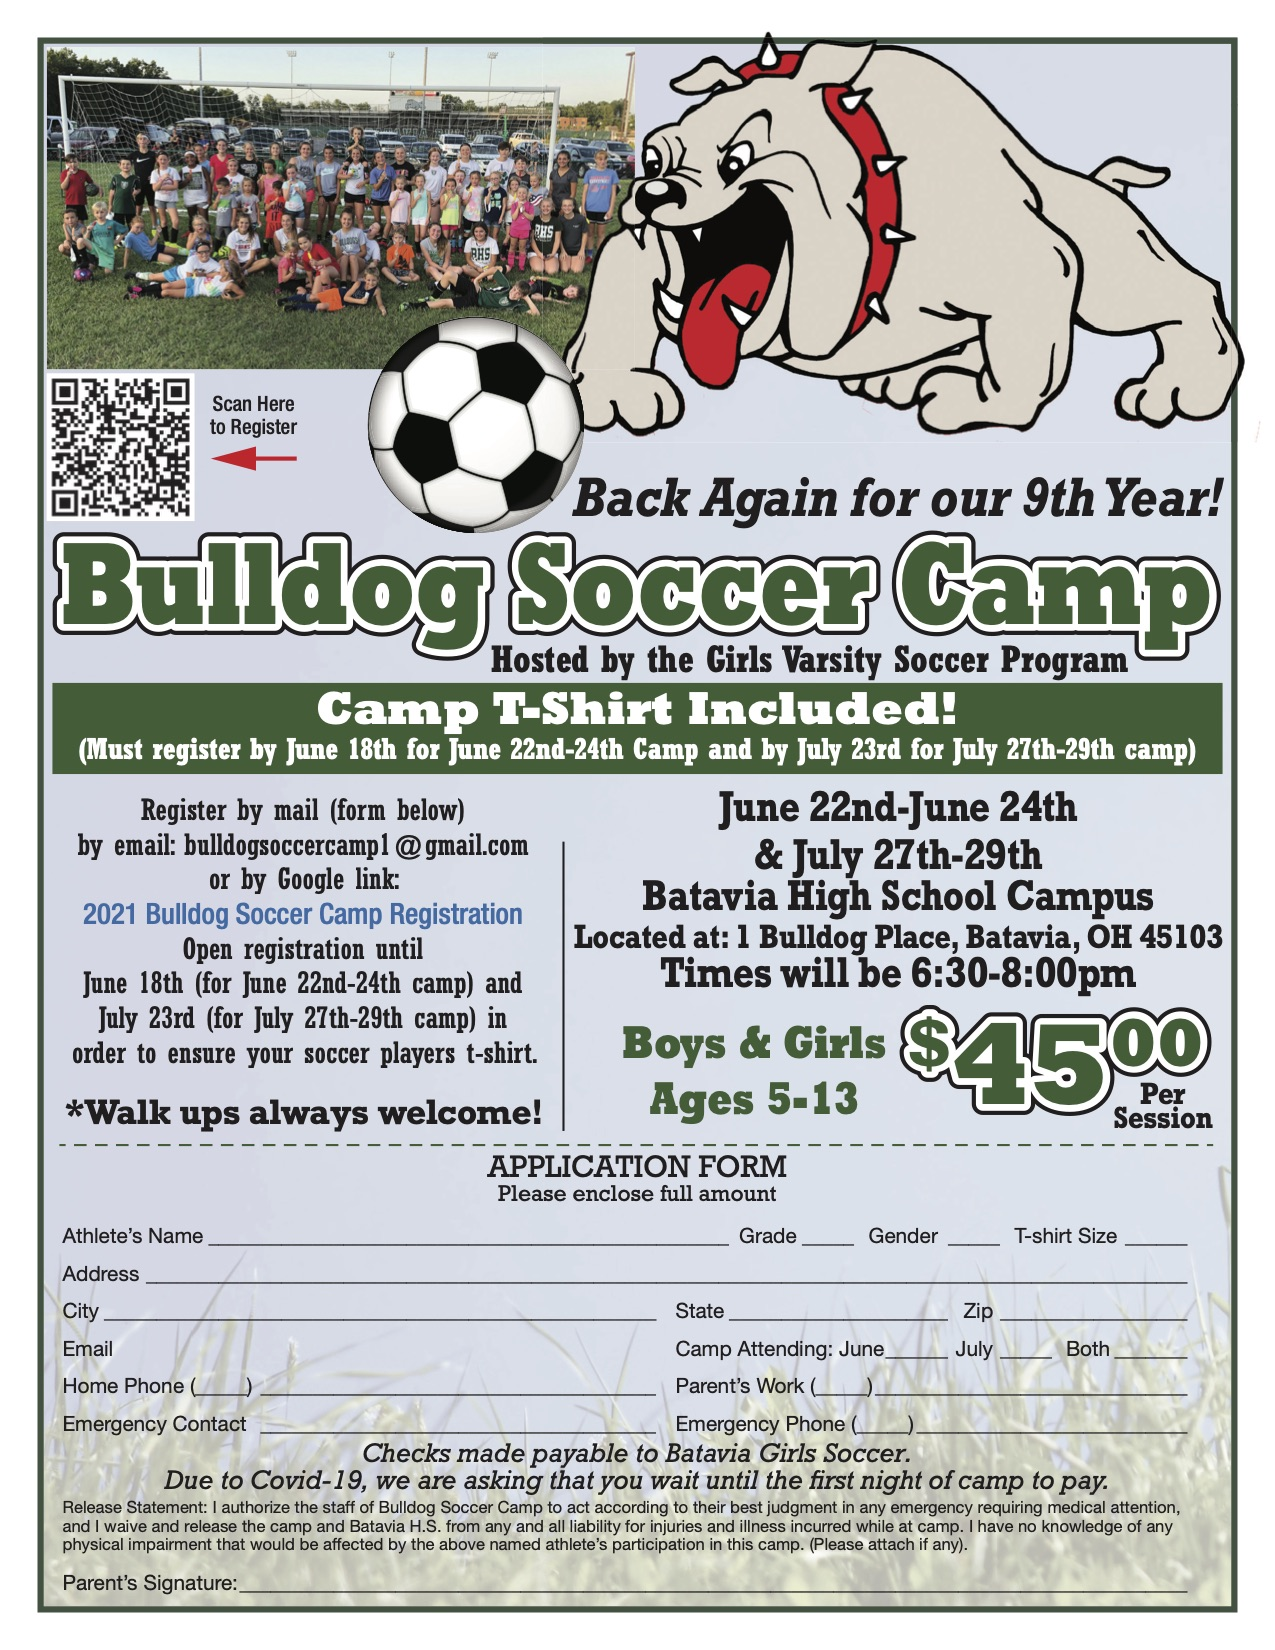 BHS girls soccer team summer camp june 22 -24 and june 27 - 29